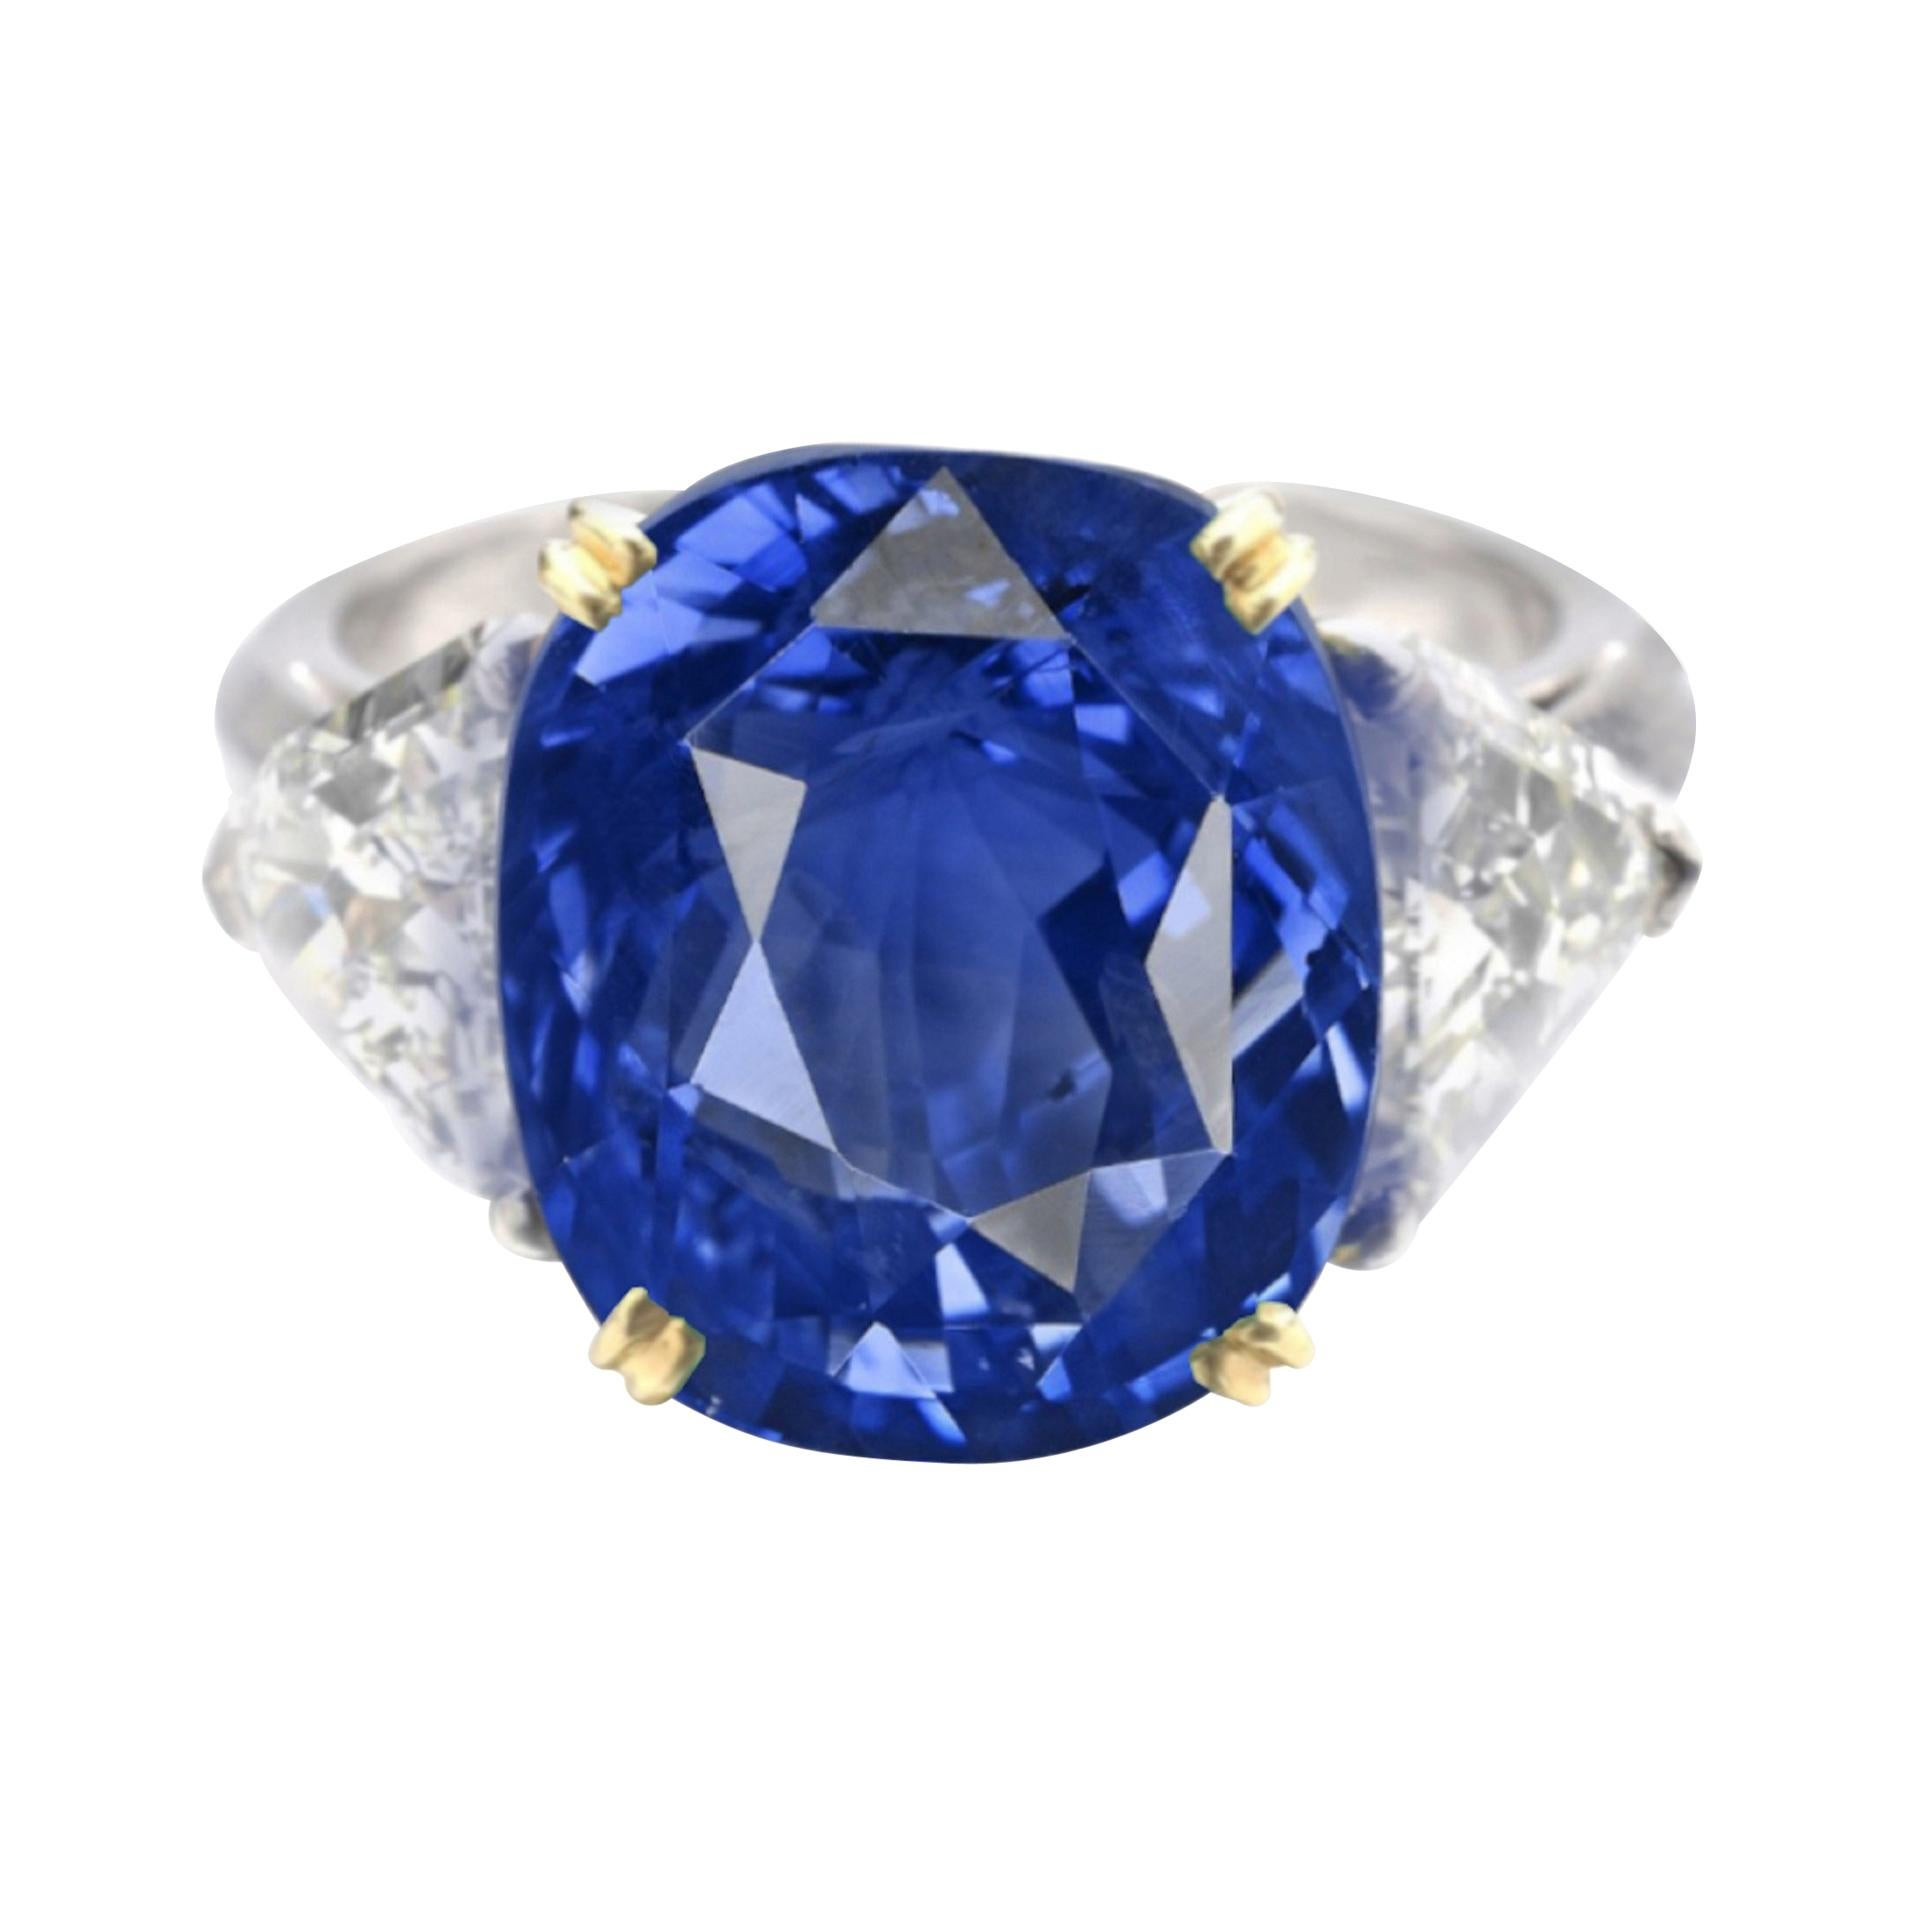 SSEF Switzerland 8 Carat Antique Cushion Ceylon Sapphire Diamond Platinum Ring